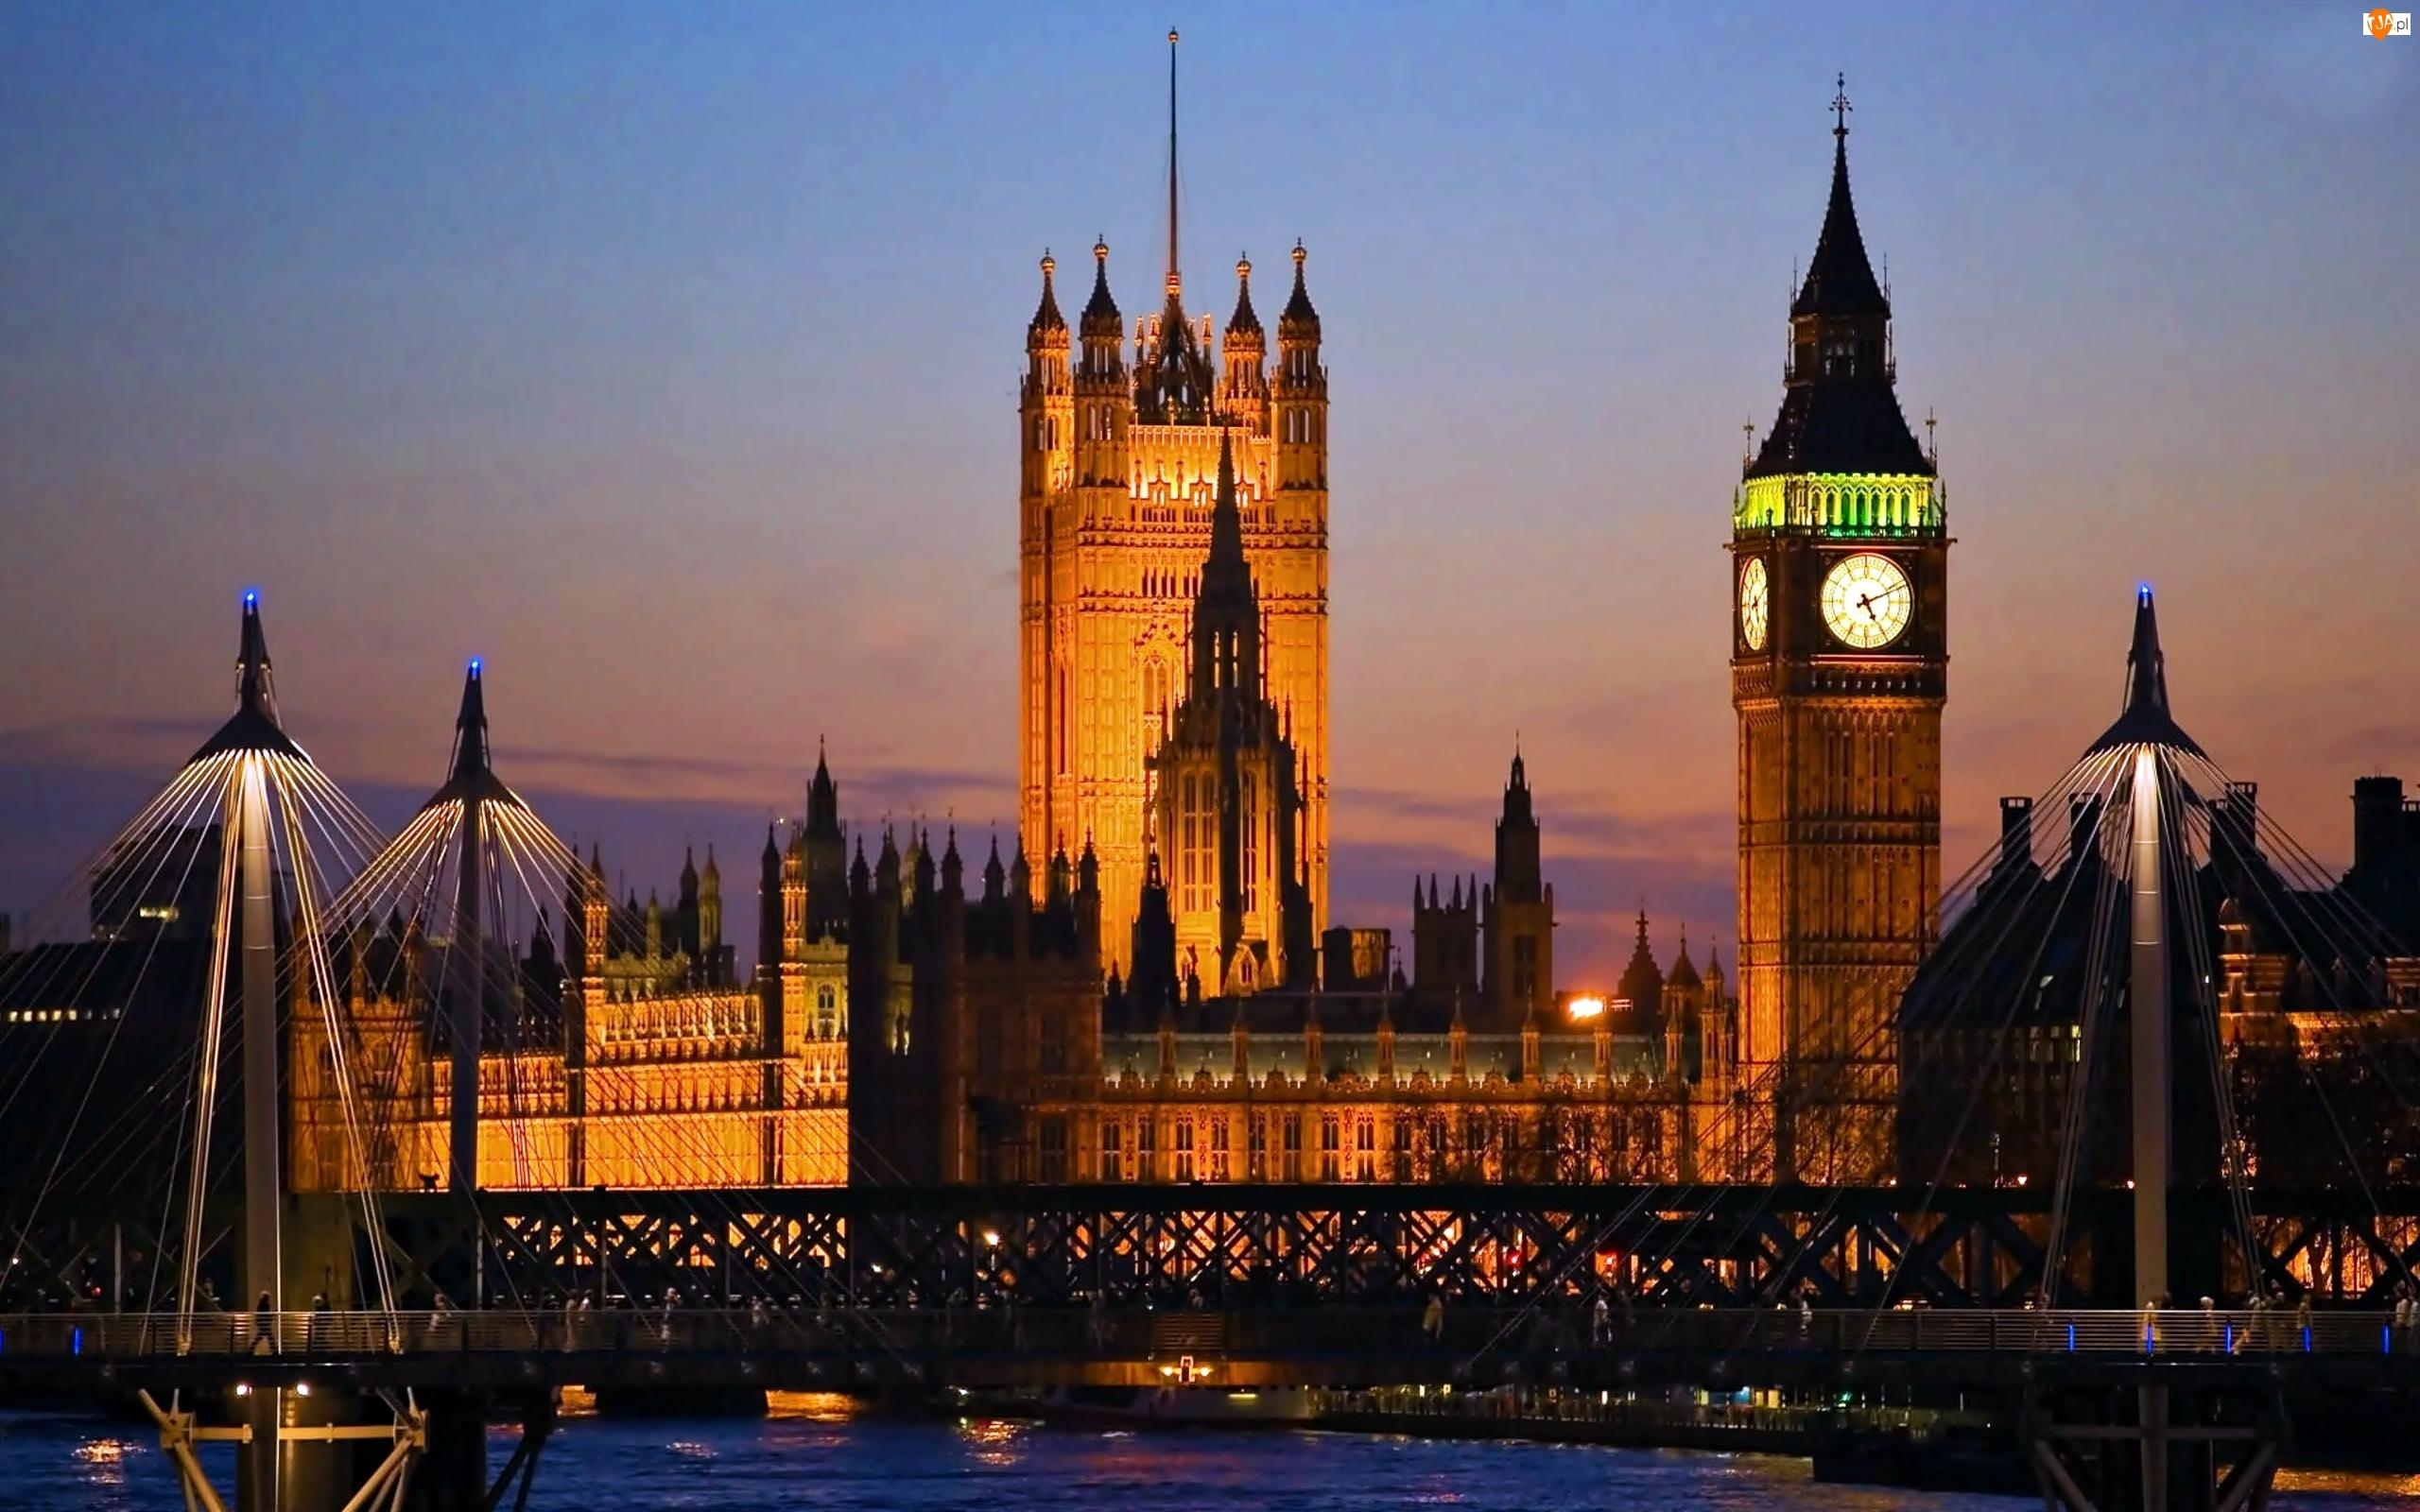 Panorama, Most, Pałac, Big Ben, Londynu, Westminster, Nocna